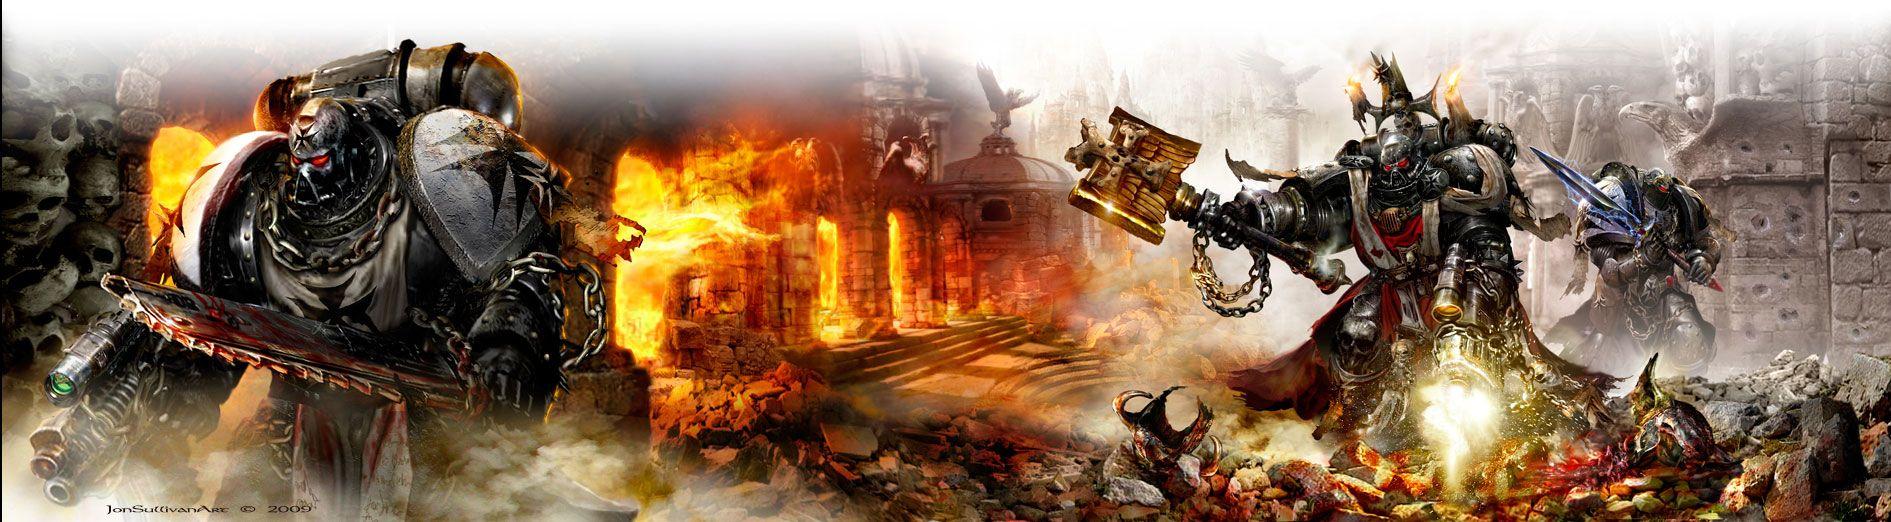 Warhammer 40k death company wallpaper - Warhammer 40000